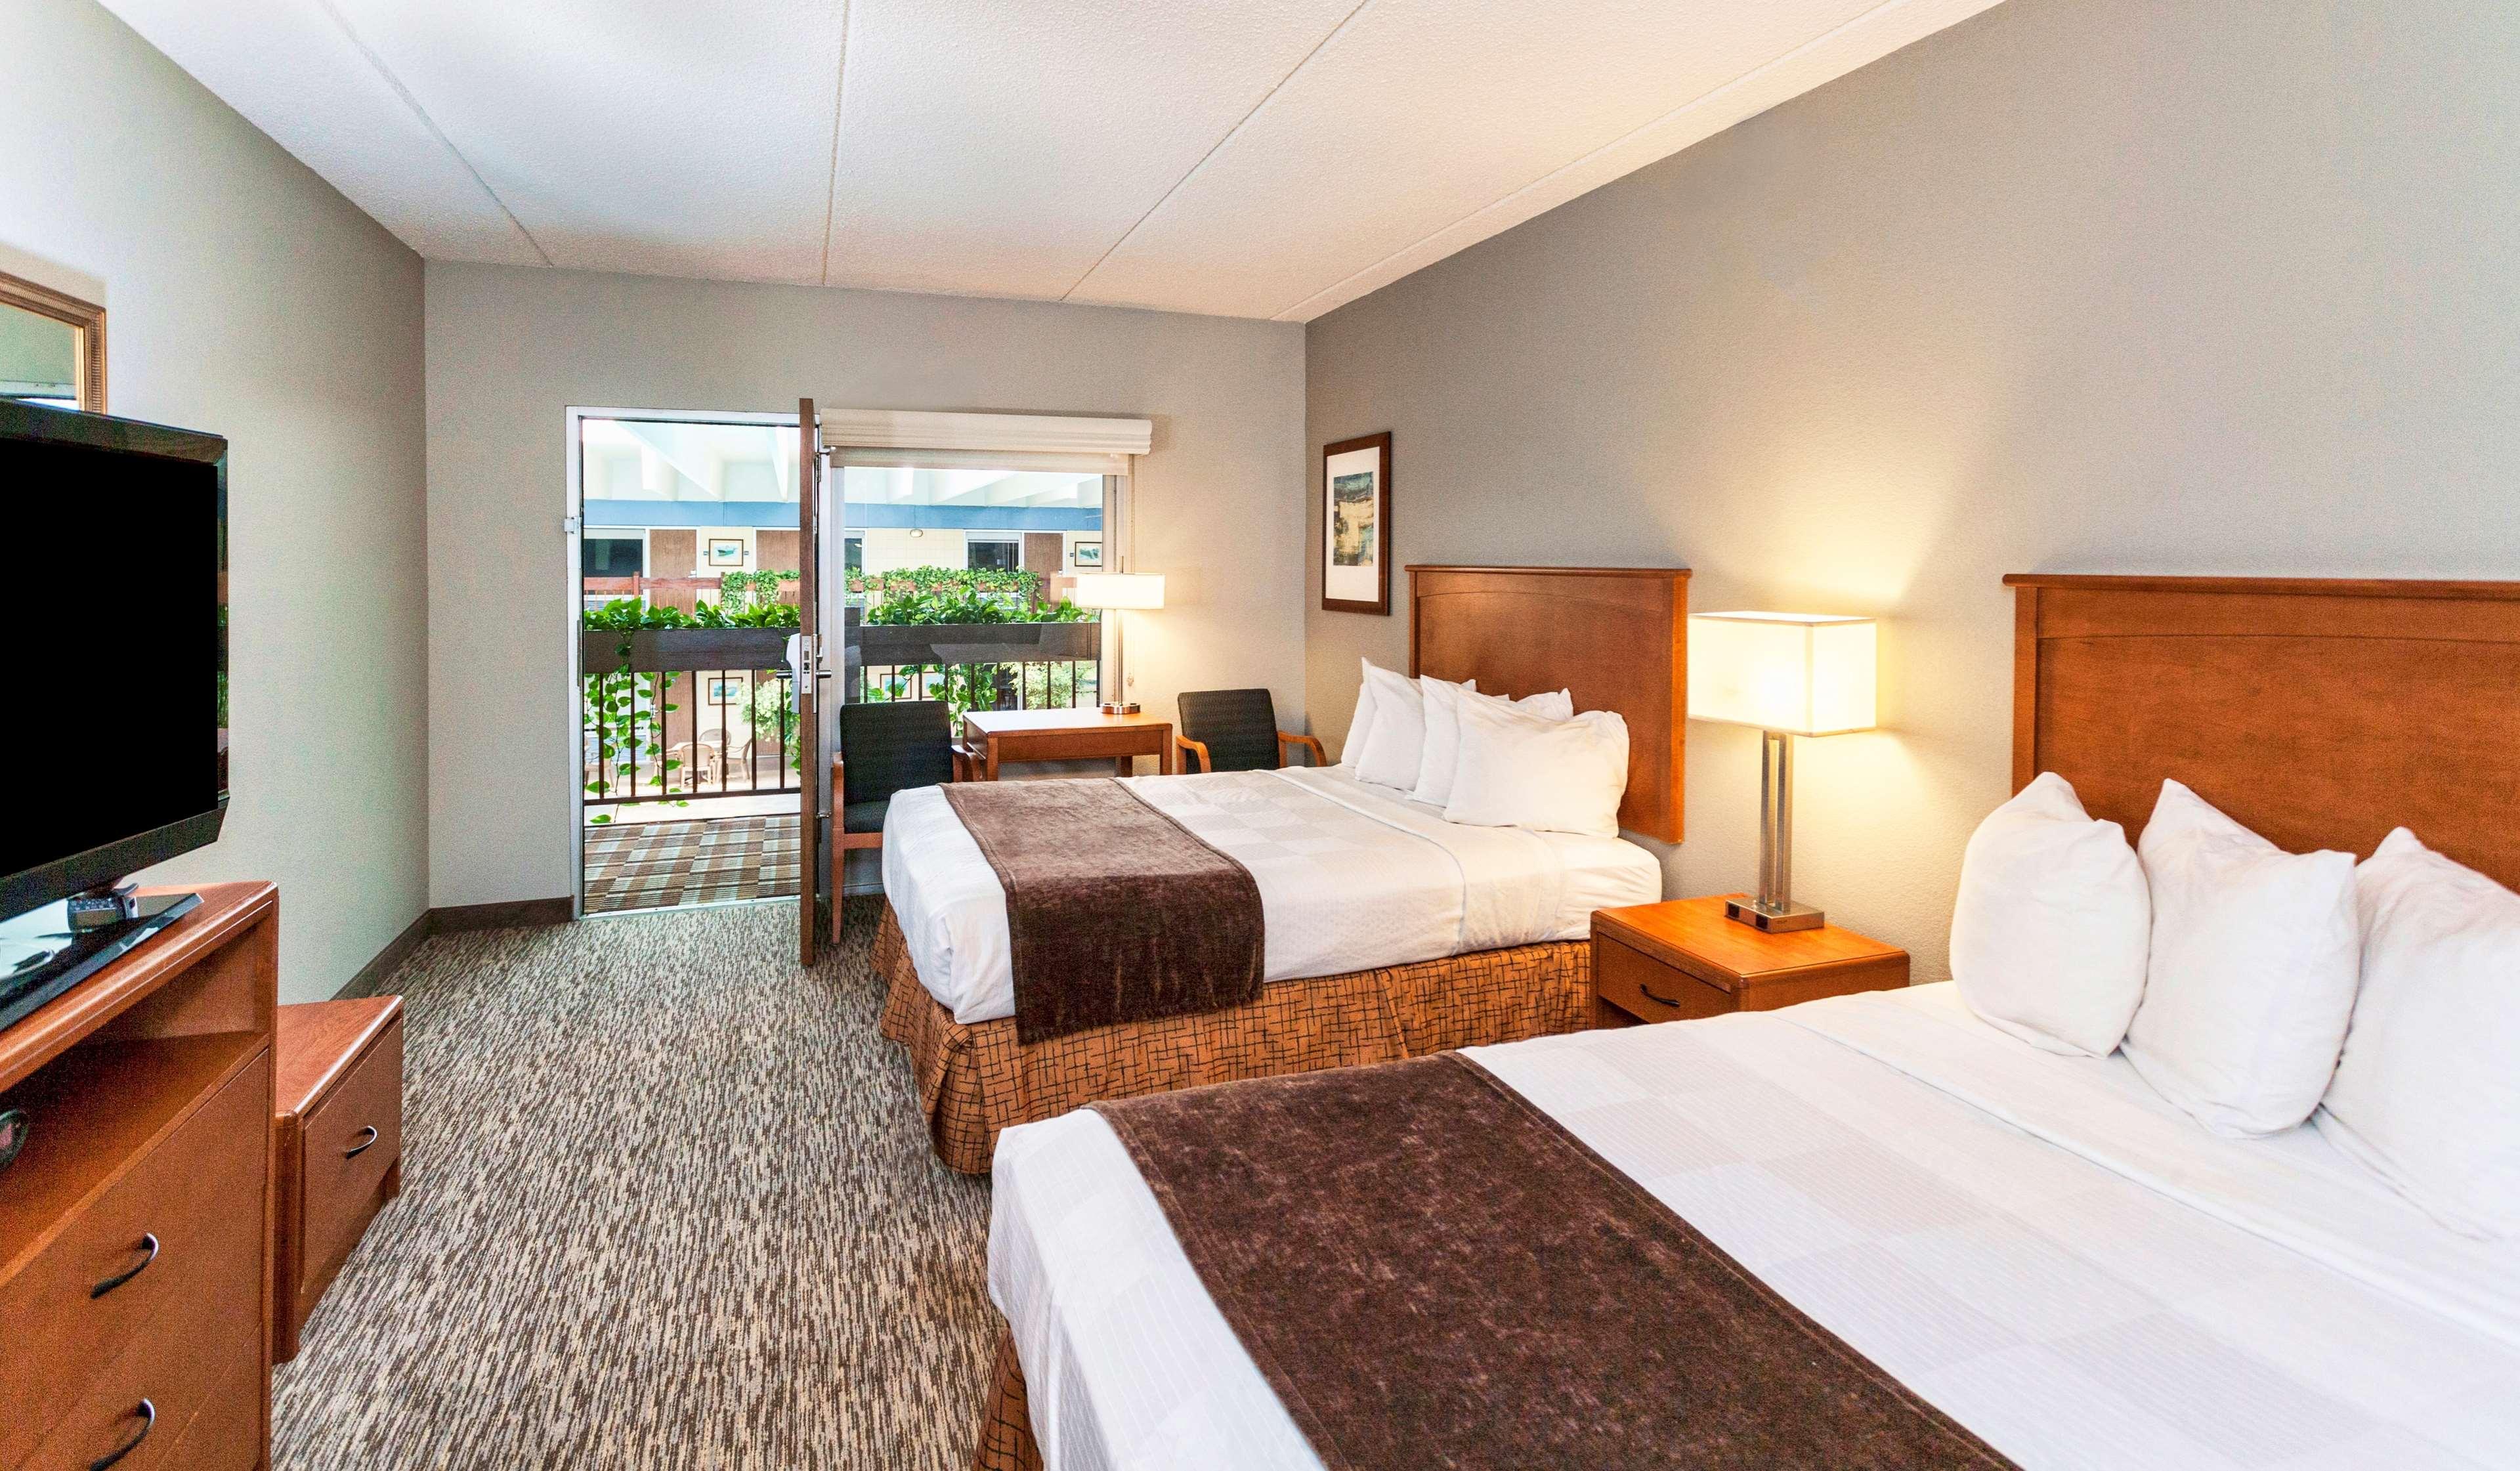 Best Western Bridgeview Hotel image 18